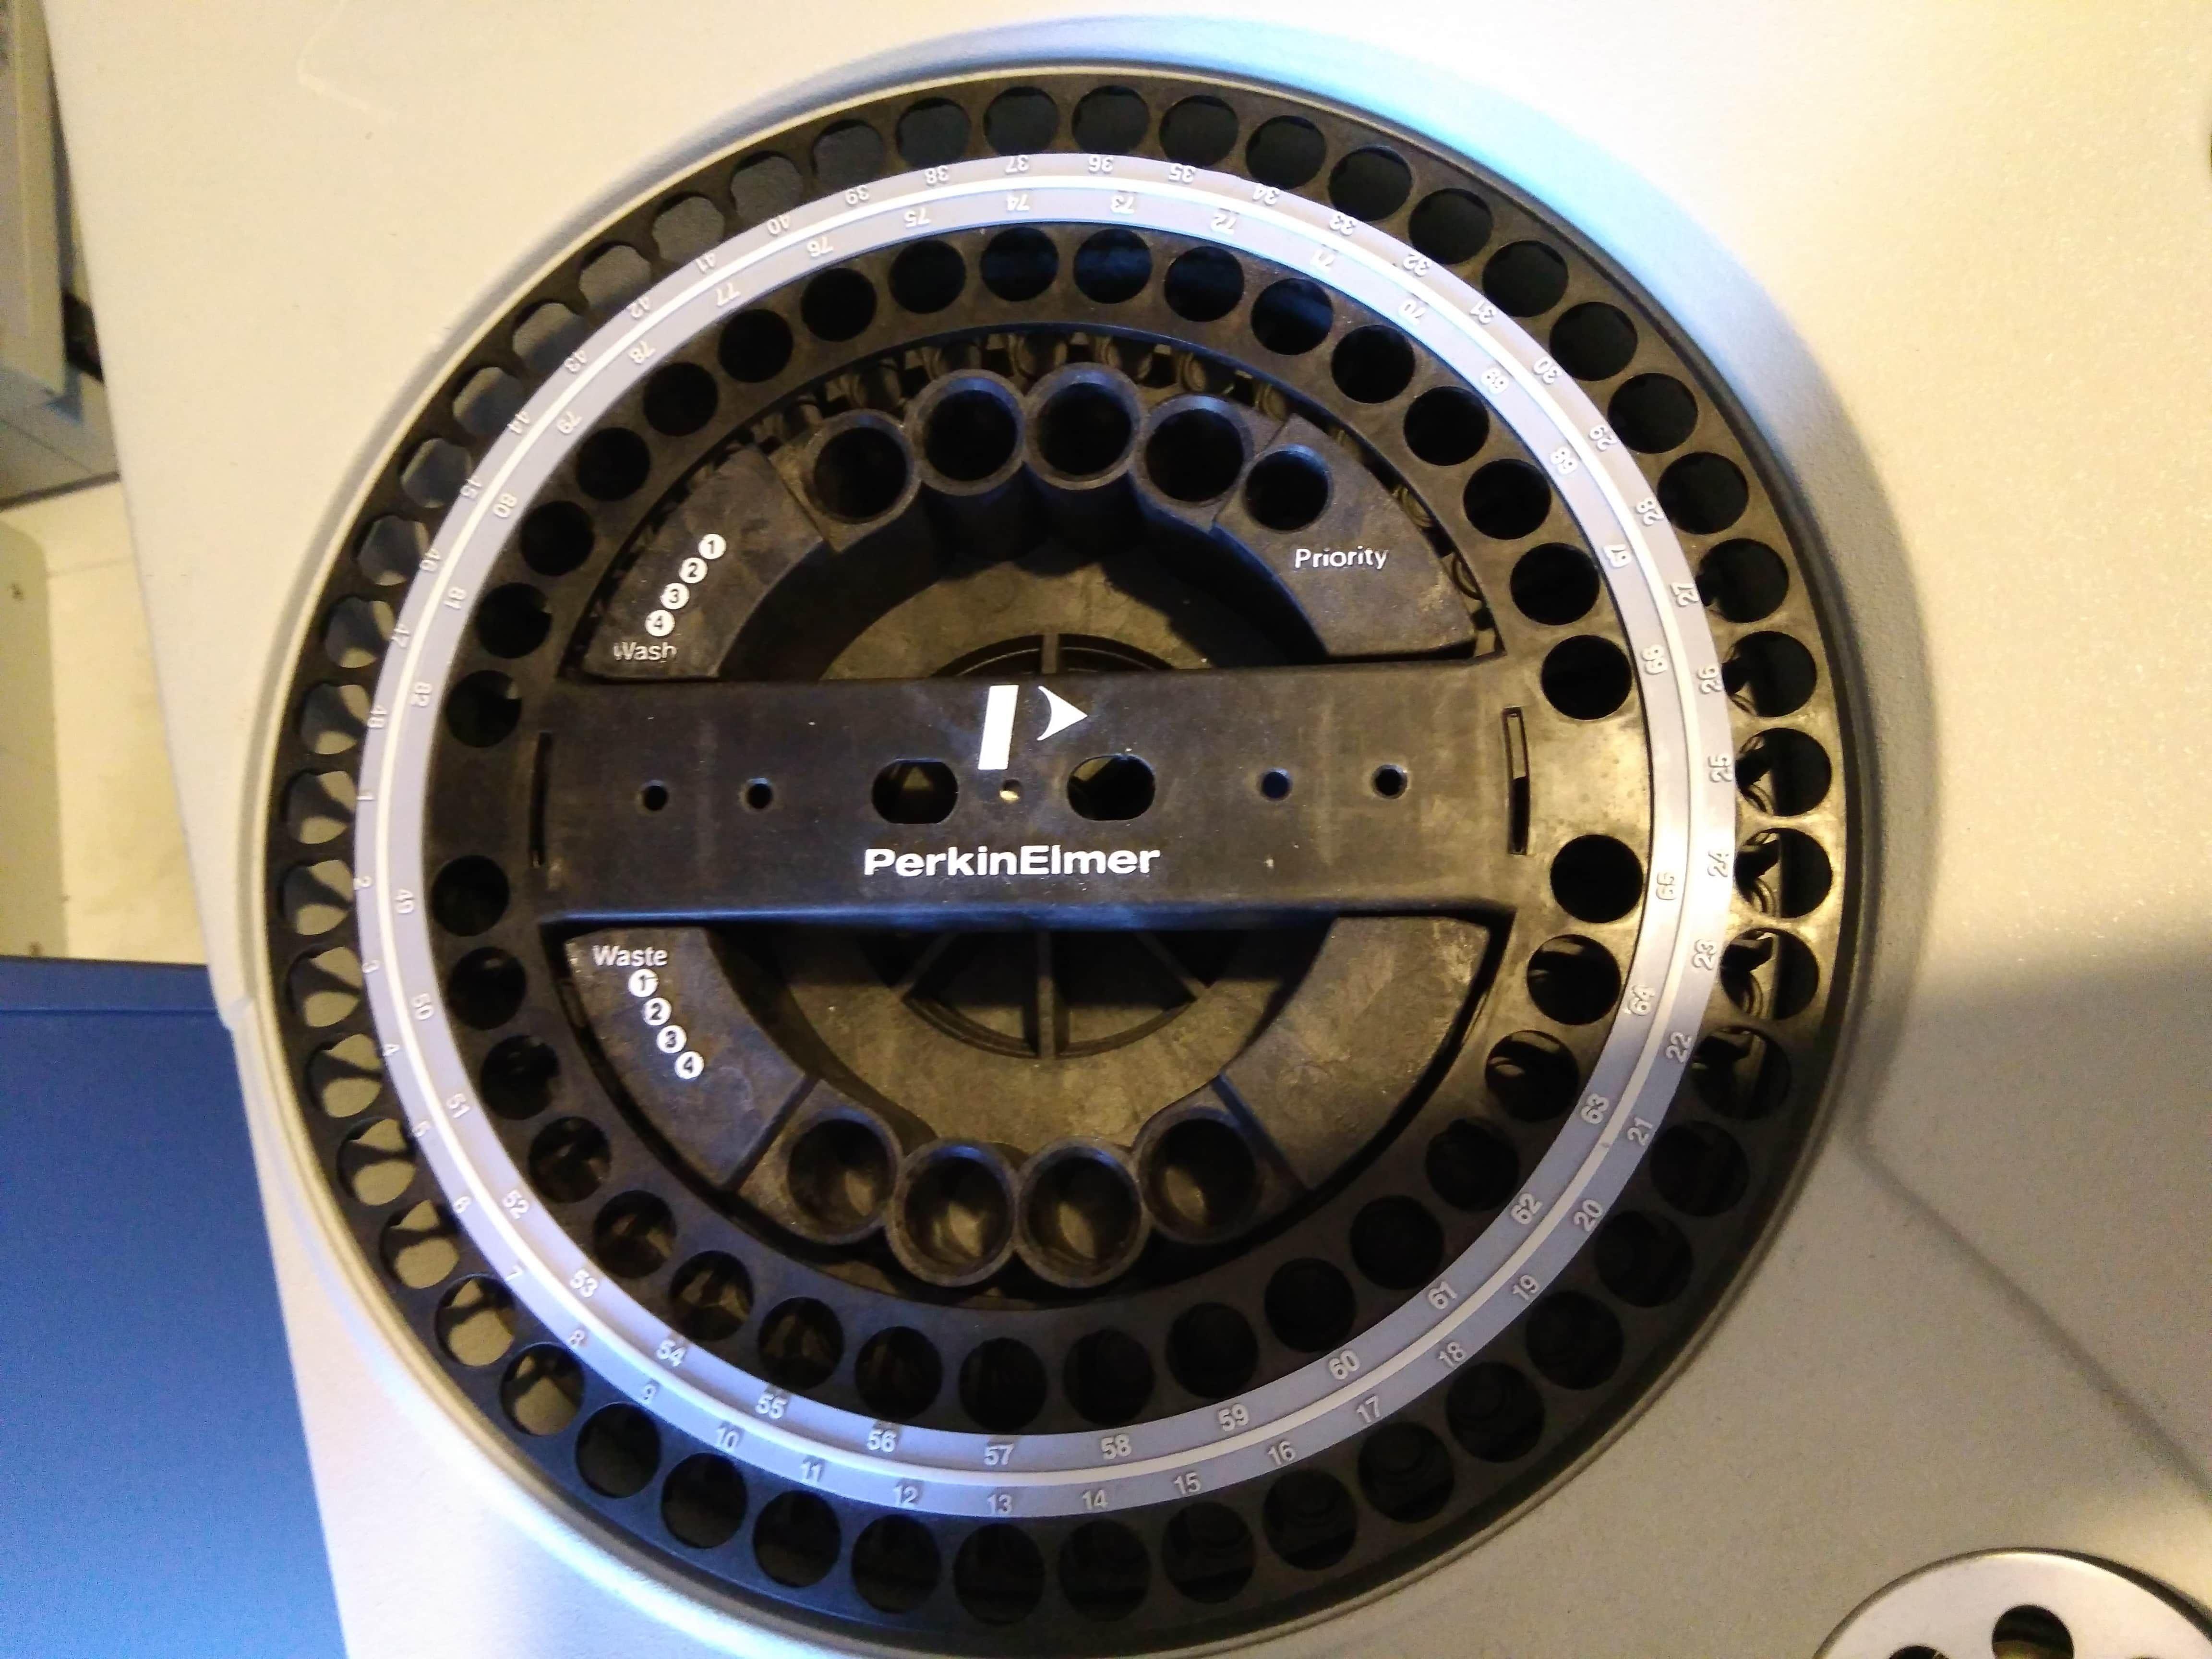 Perkin Elmer Clarus 500 GC Gas Chromatograph System Dual FID Detectors